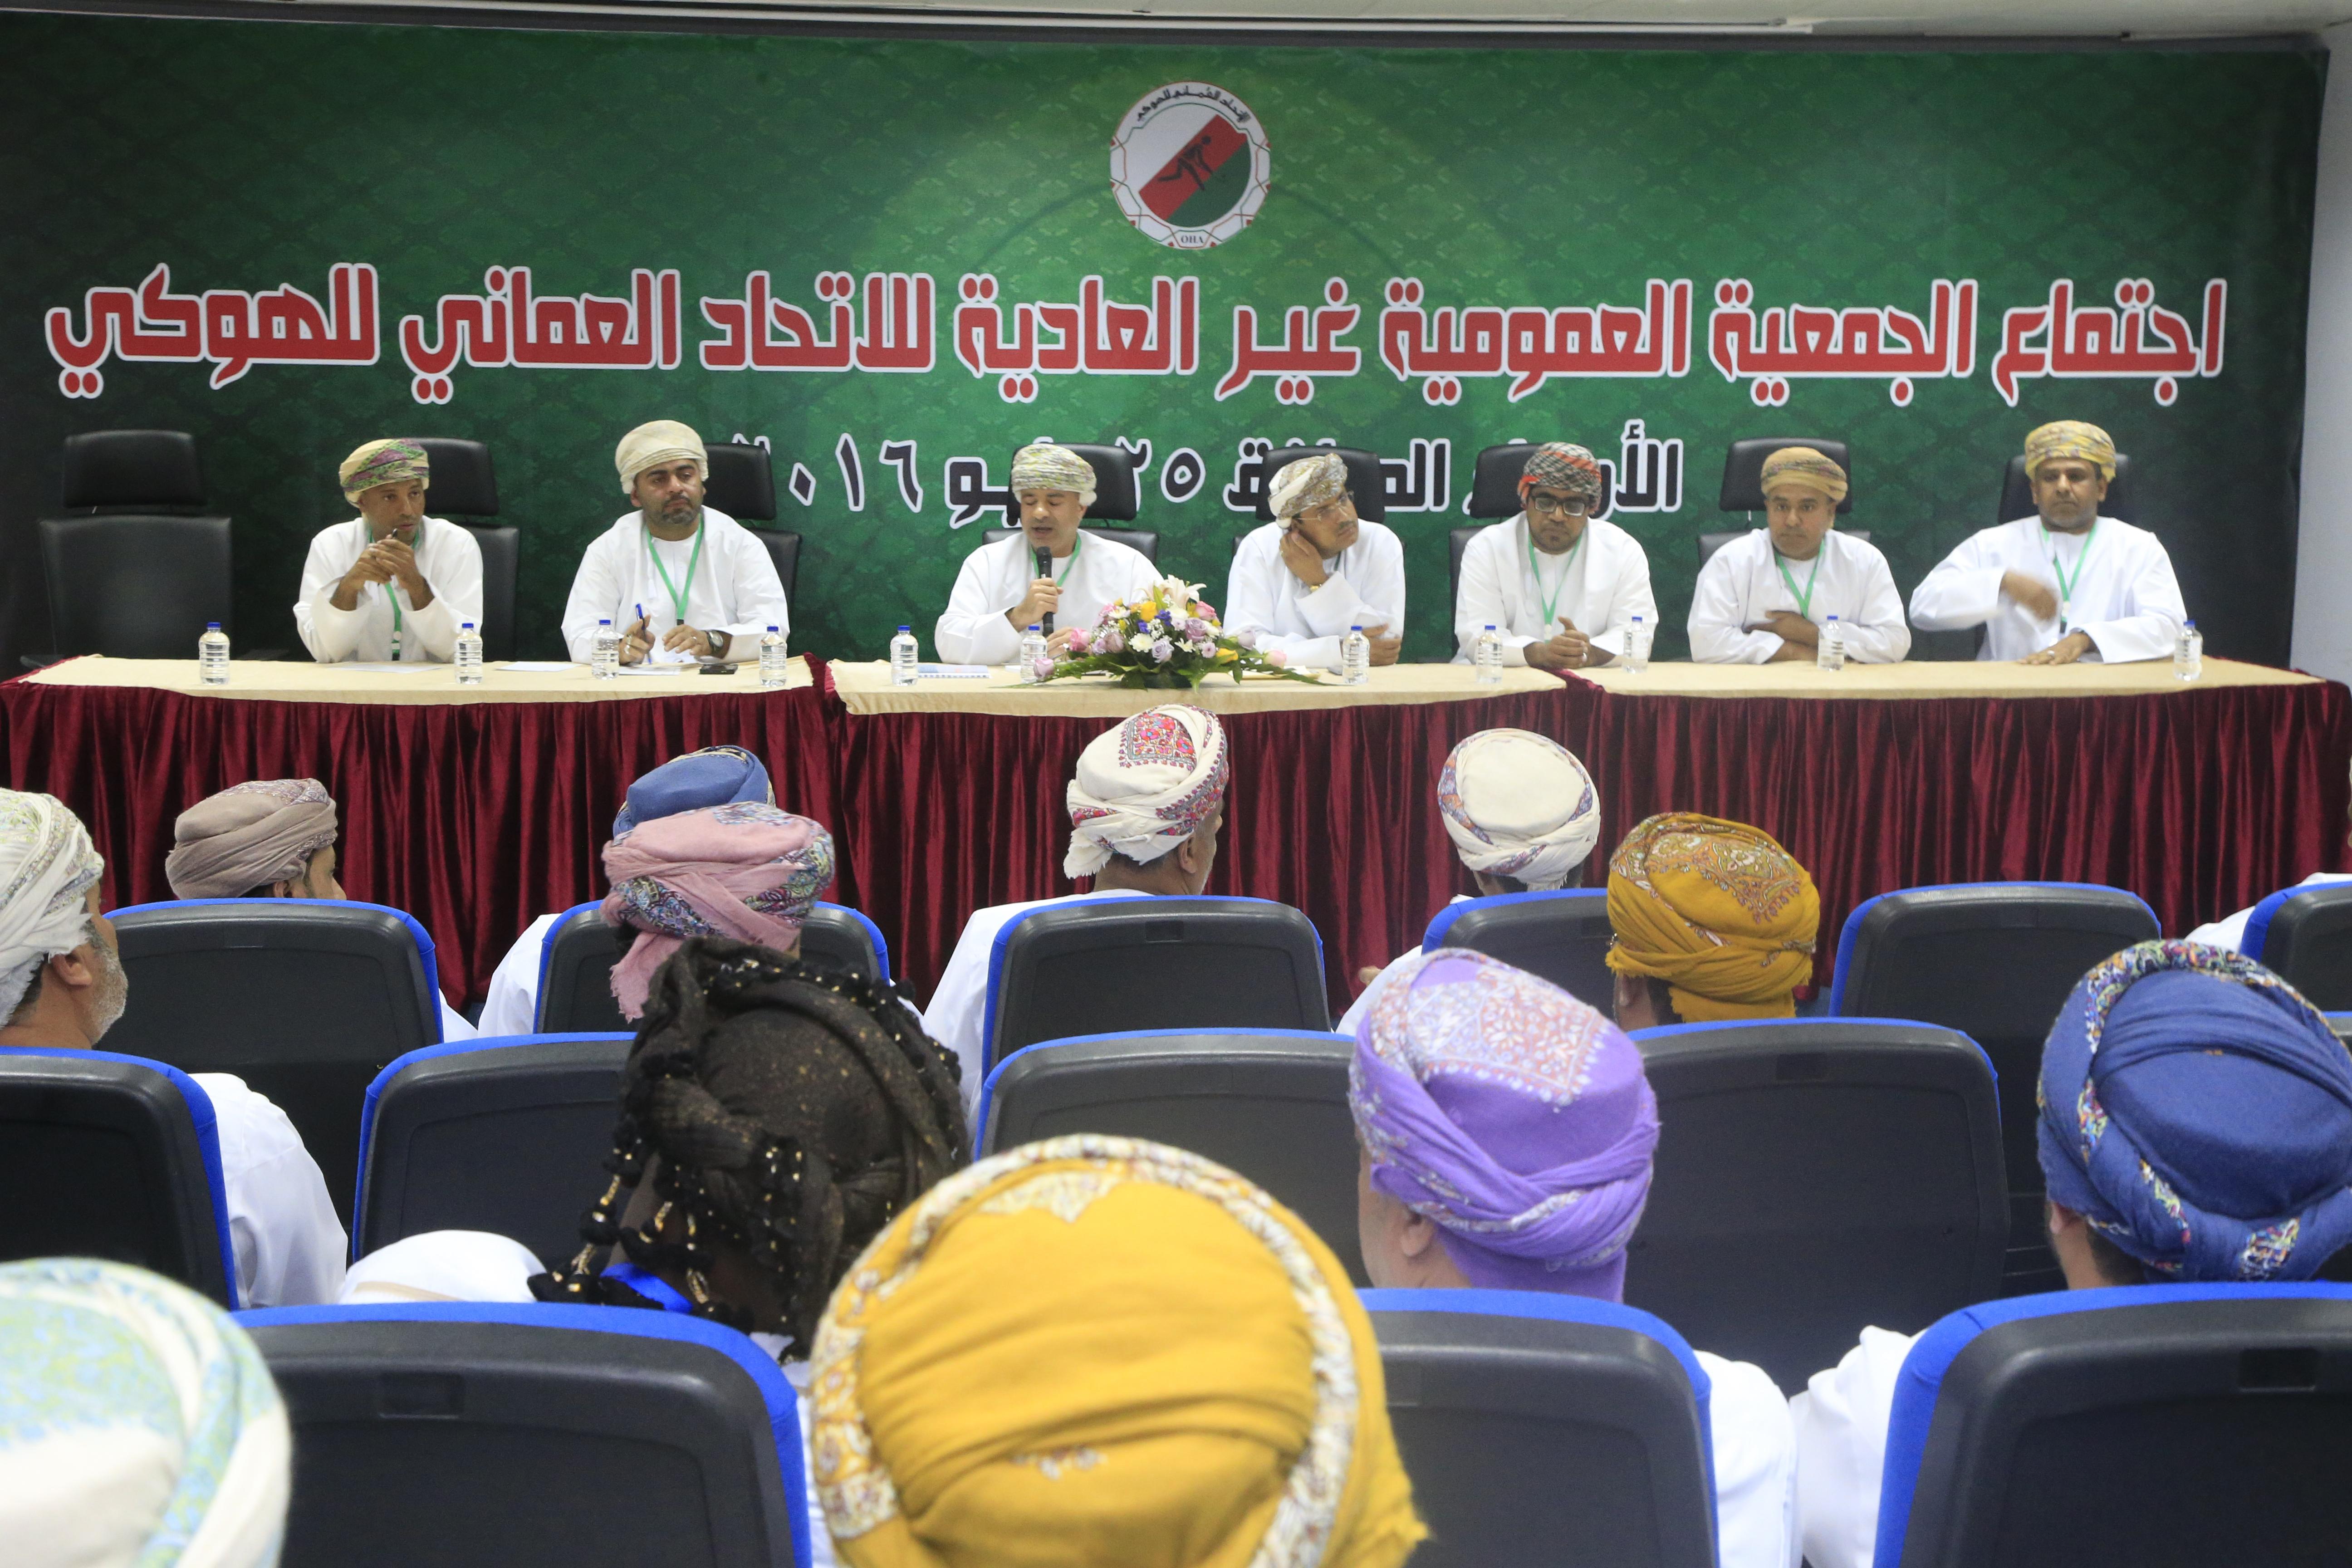 Oman Hockey Association board members win vote of confidence